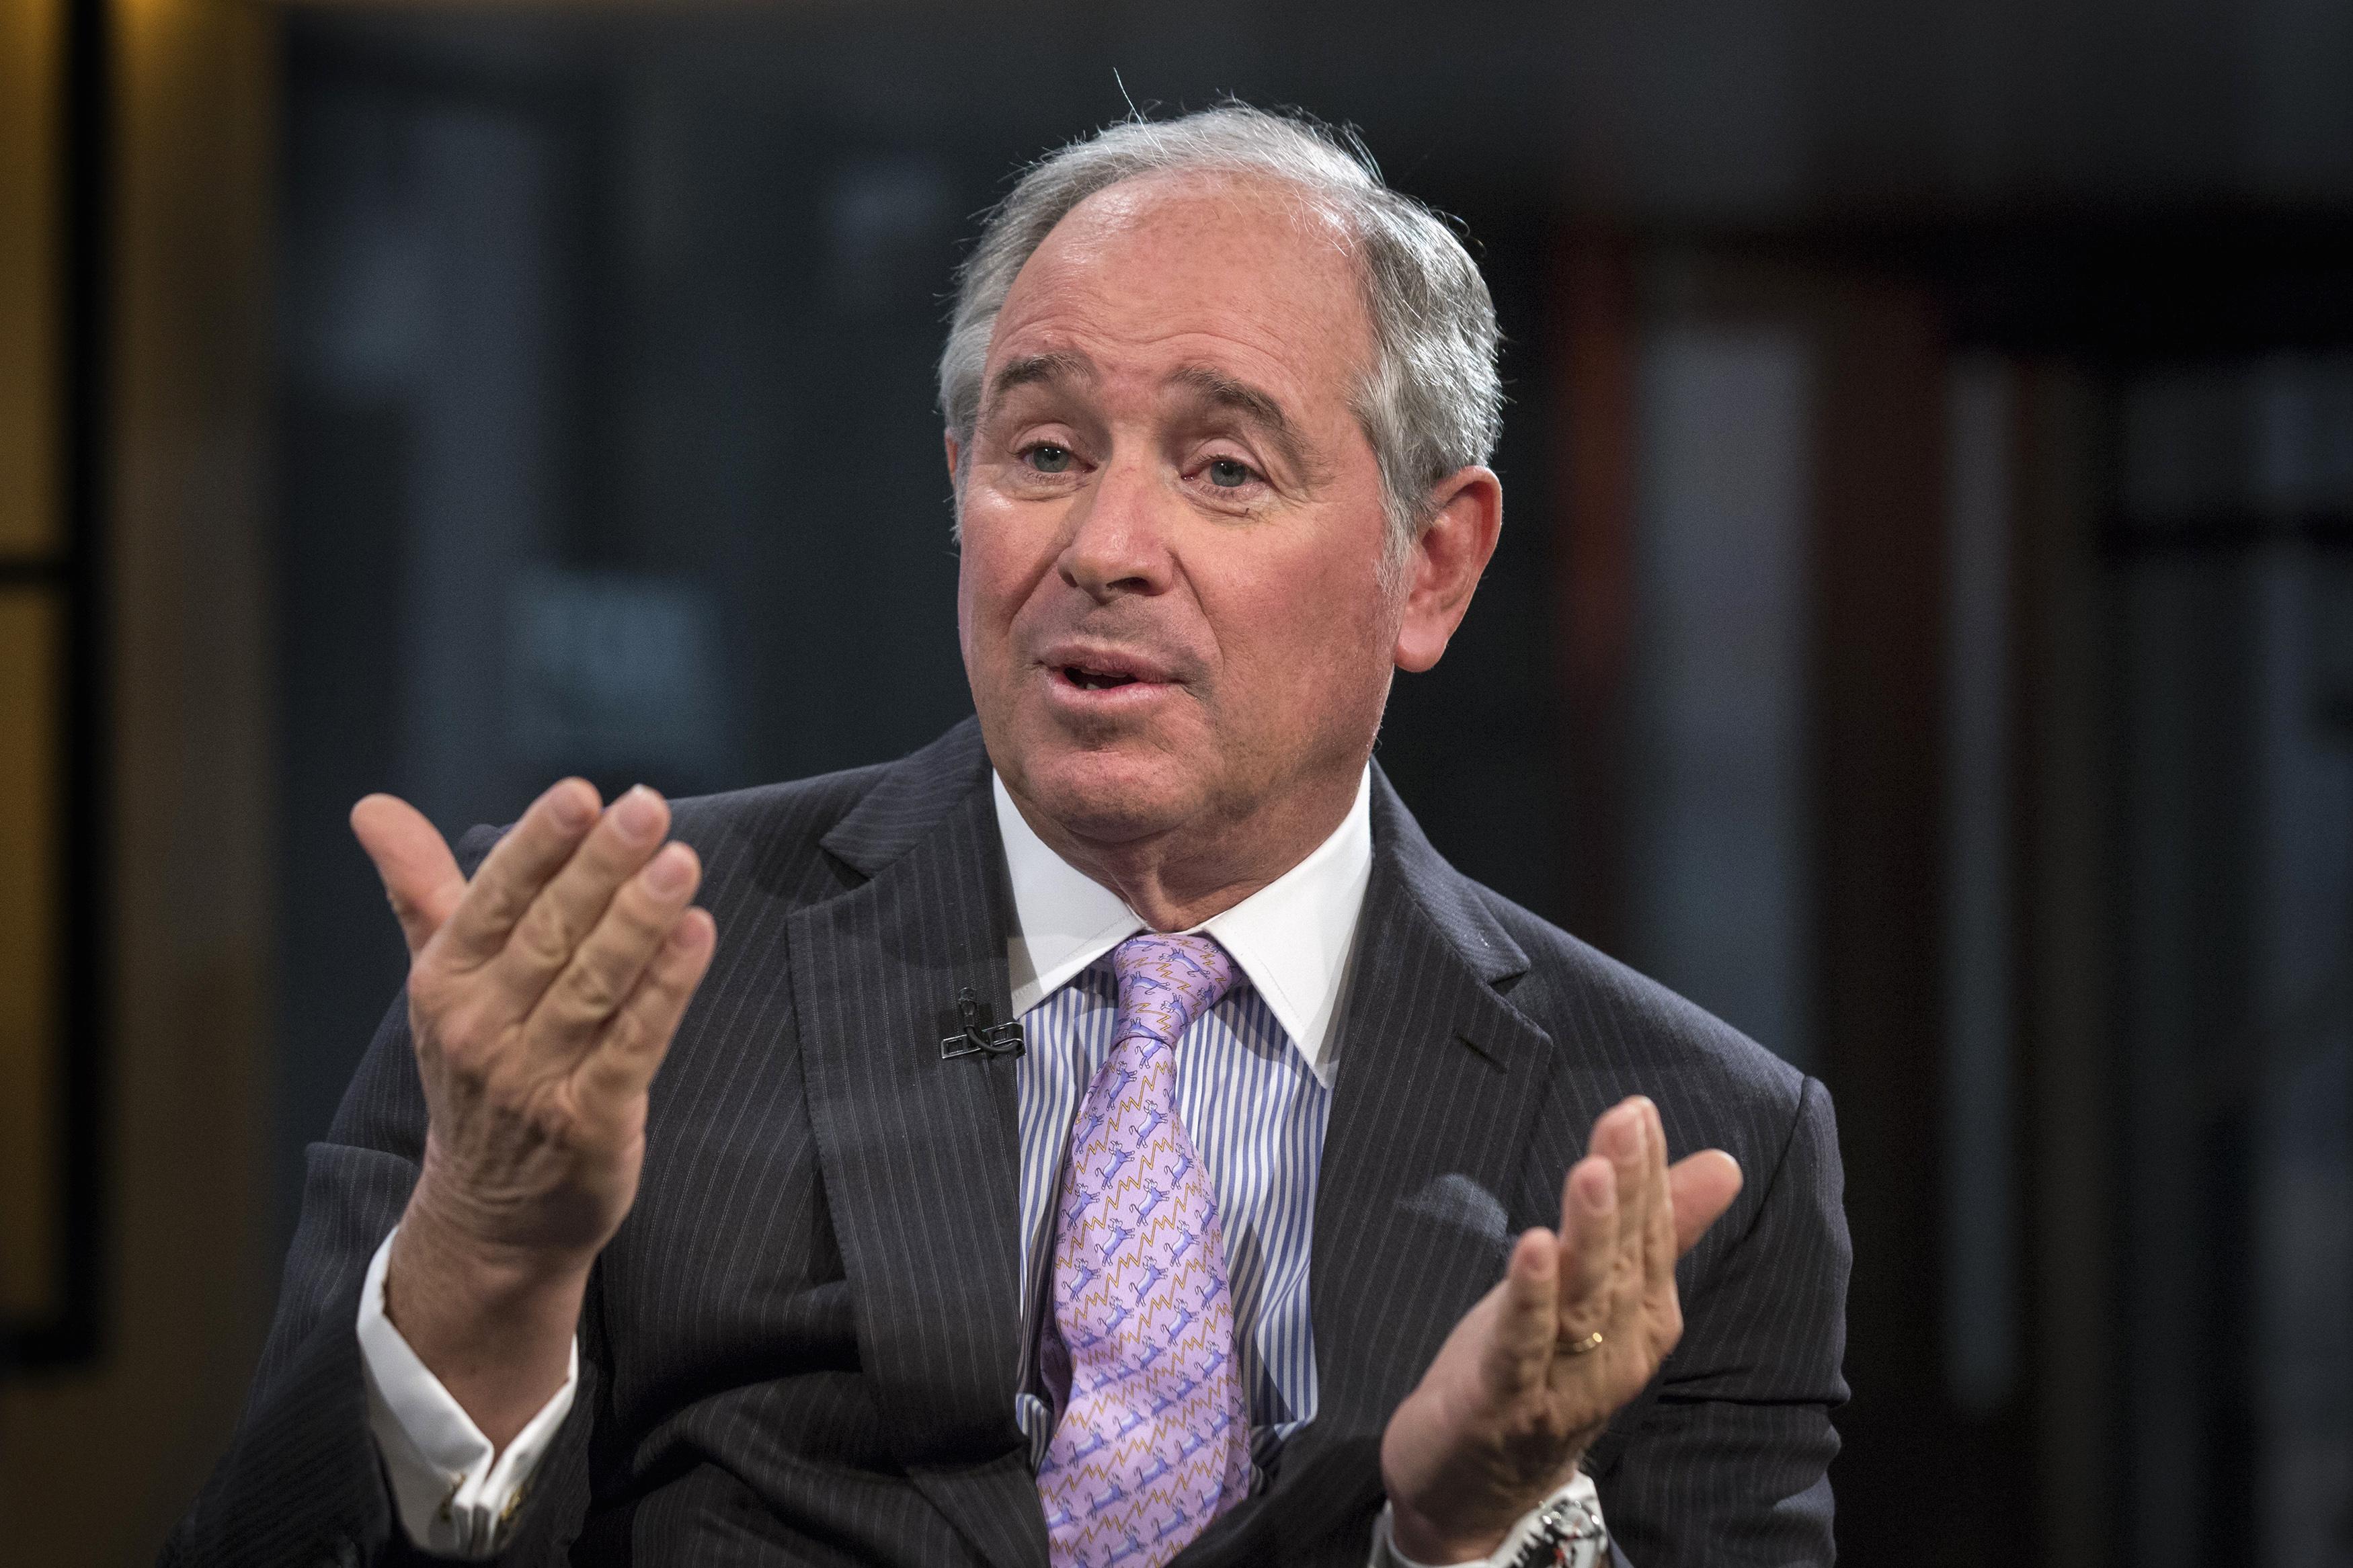 Blackstone's Q1 earnings soar to $1.62B on asset sales; AUM hits $310B